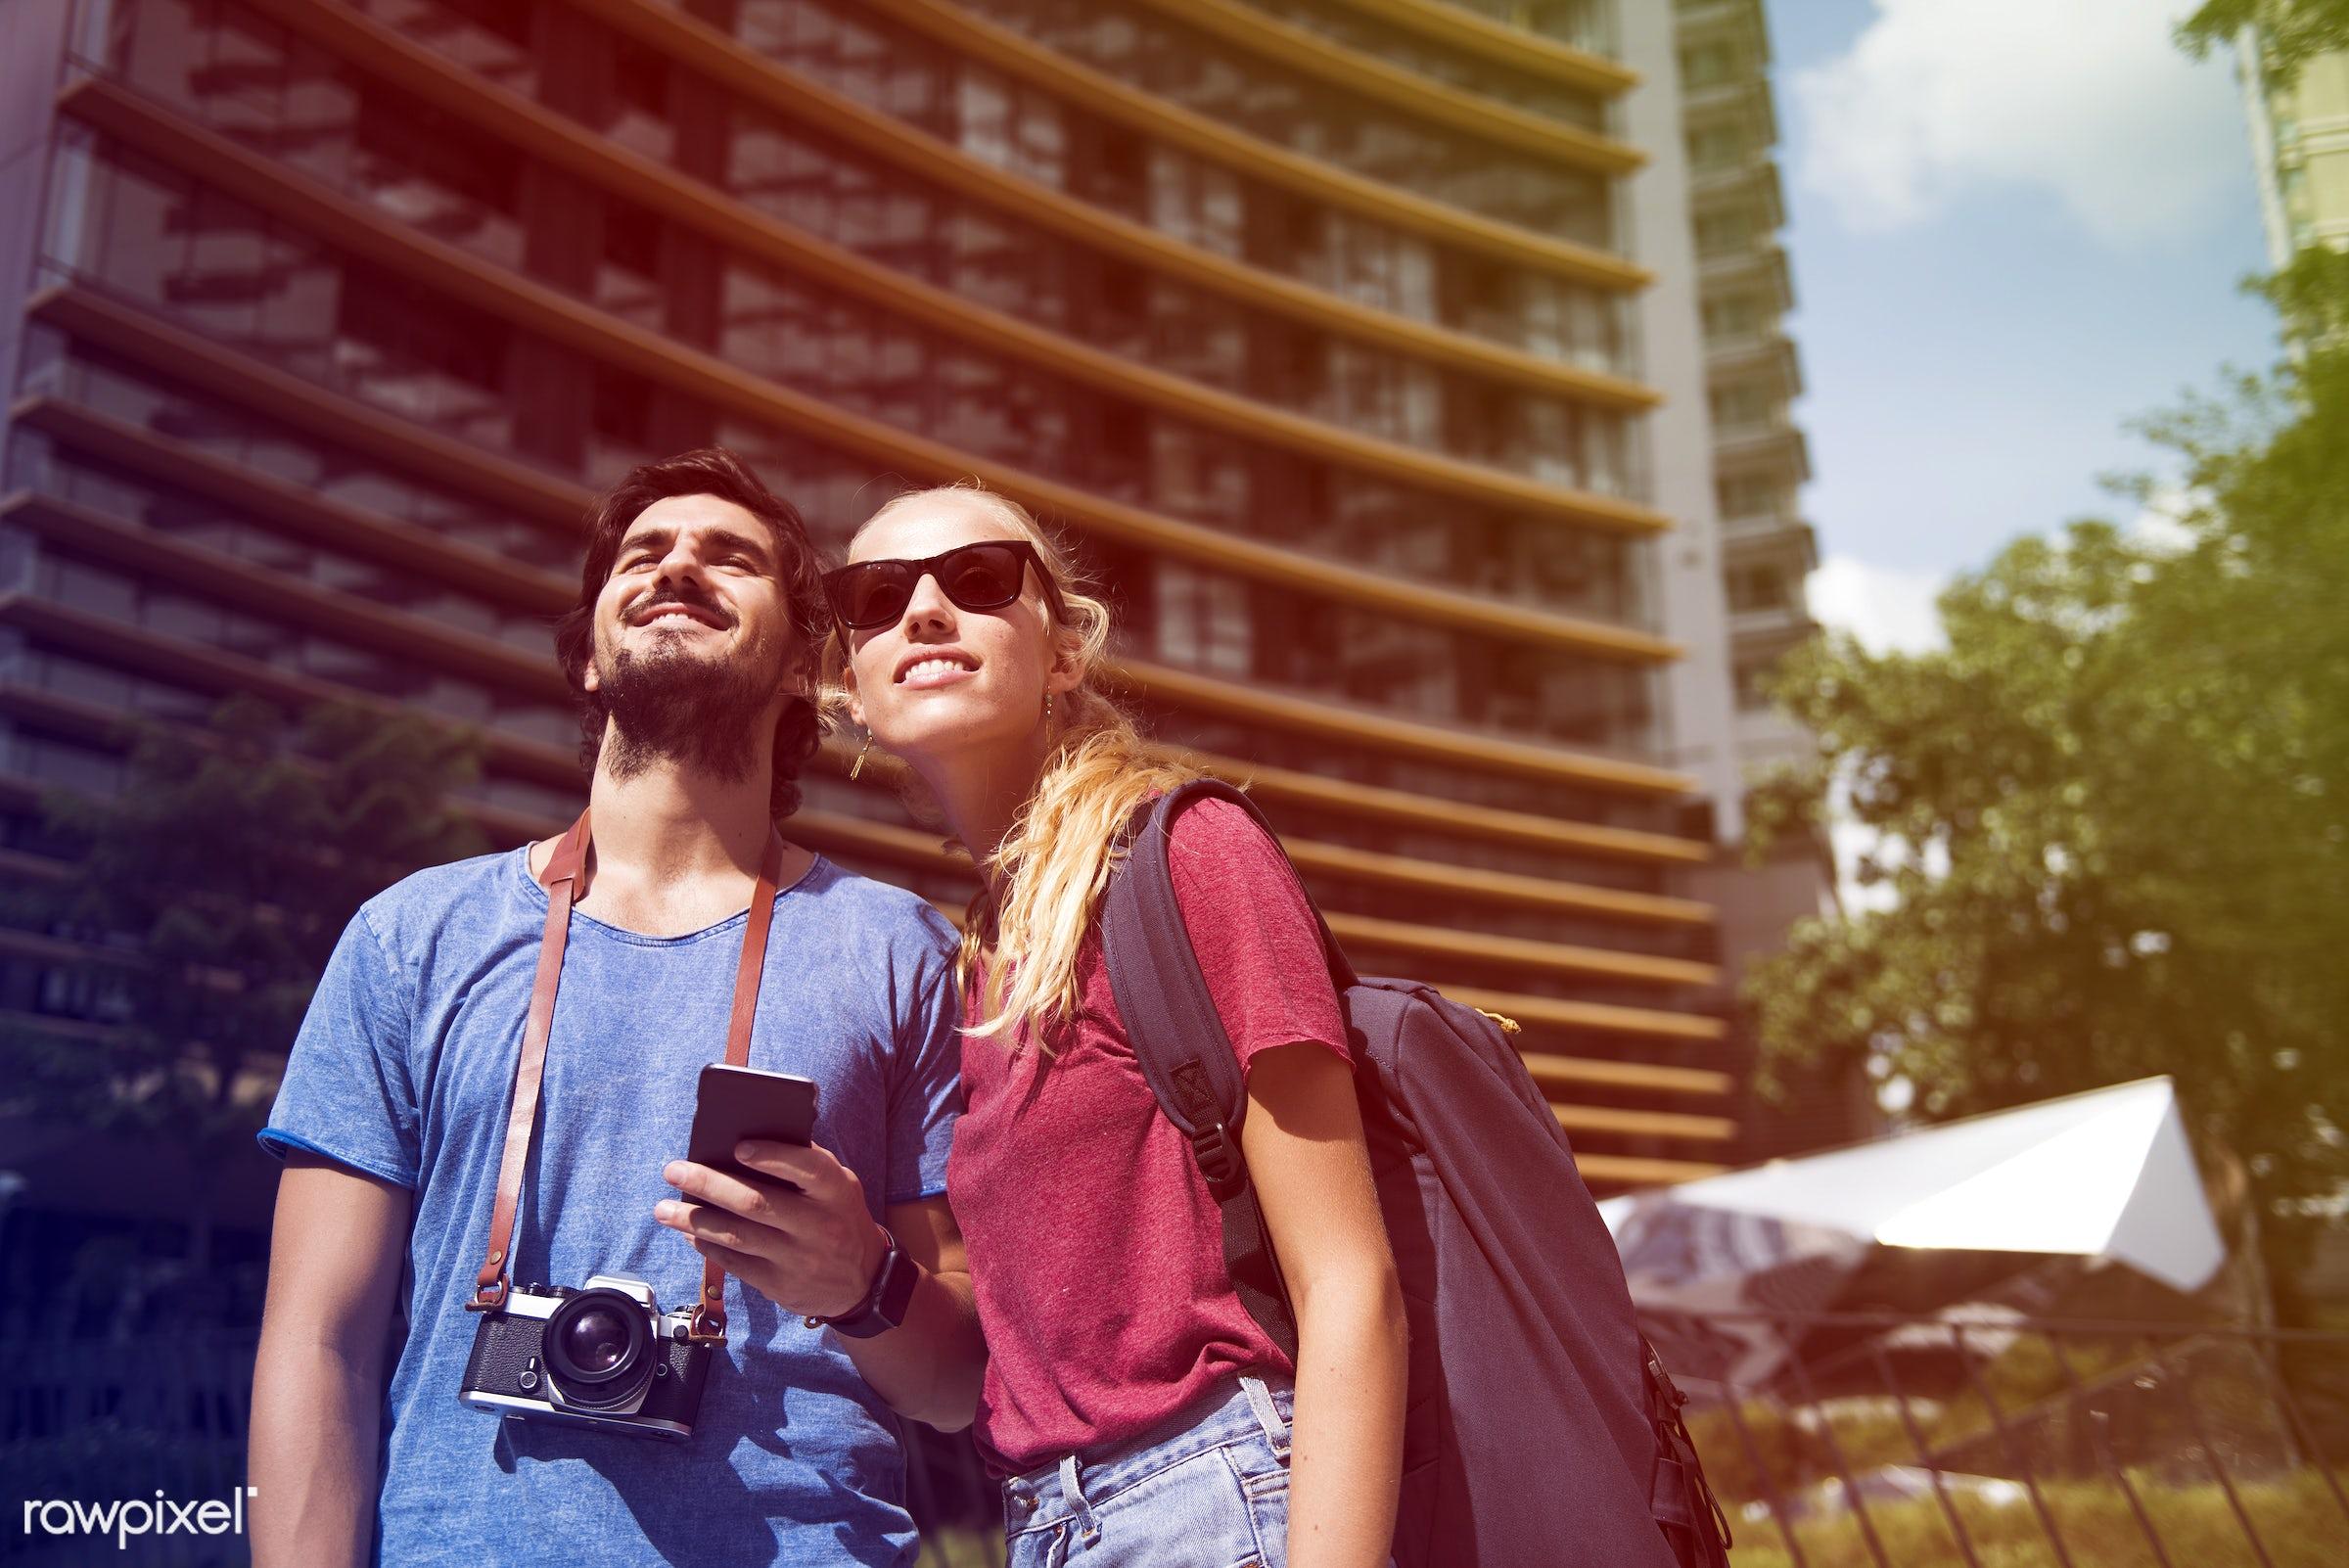 metropolis, backpackers, faded, vibrant, travel, people, wanderlust, city, center, woman, blend, buildings, partner, light,...